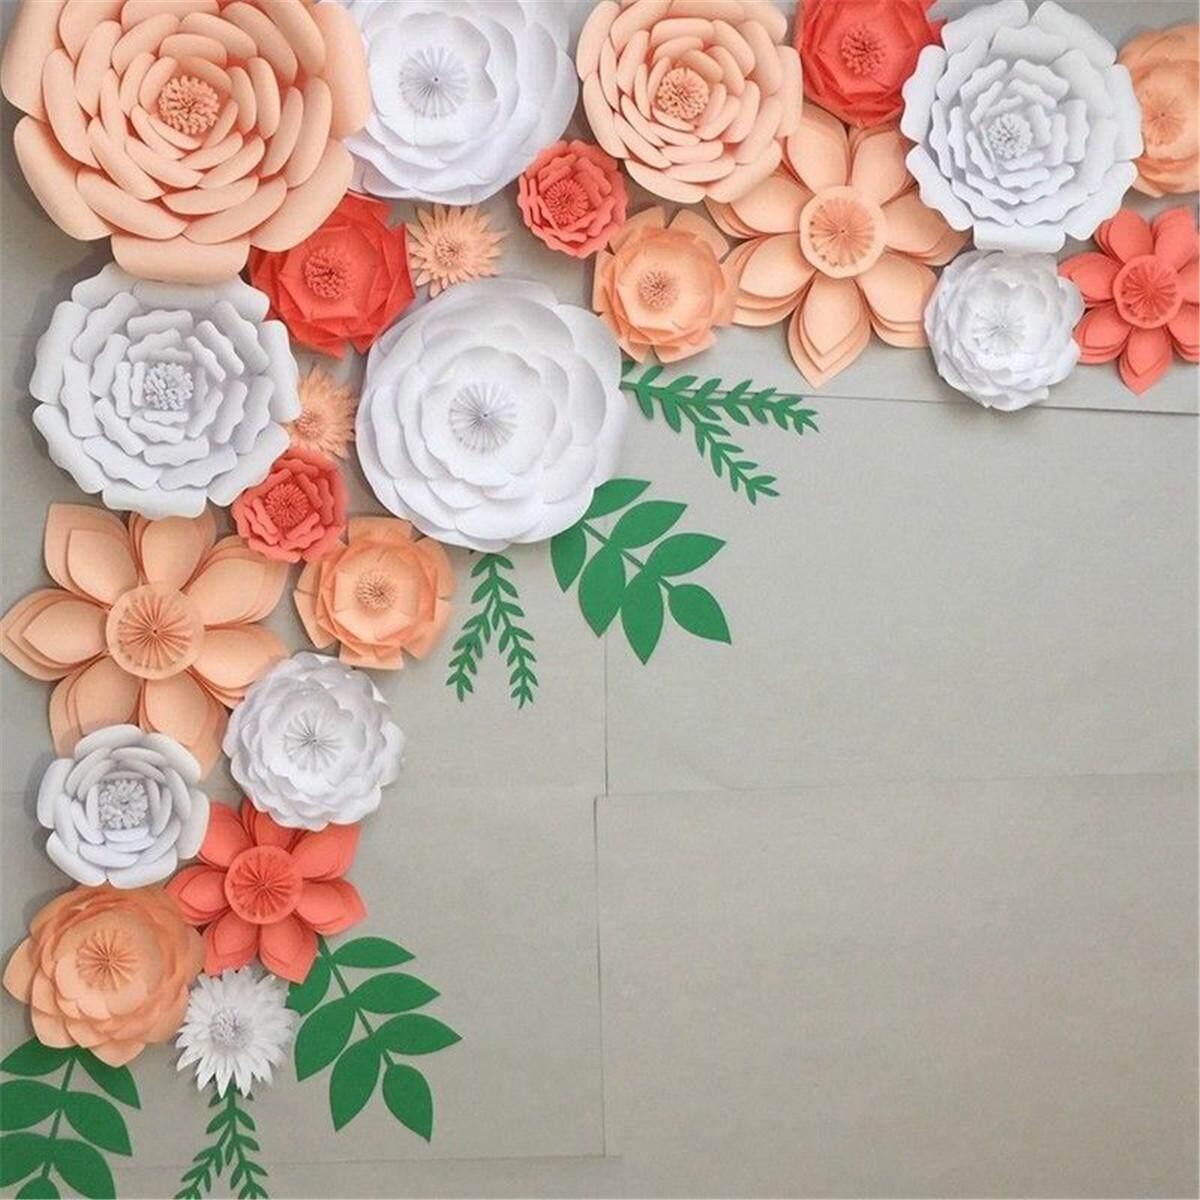 2Pcs Paper Flower Backdrop Wall 20cm Giant Rose Flowers DIY Wedding Party Decor